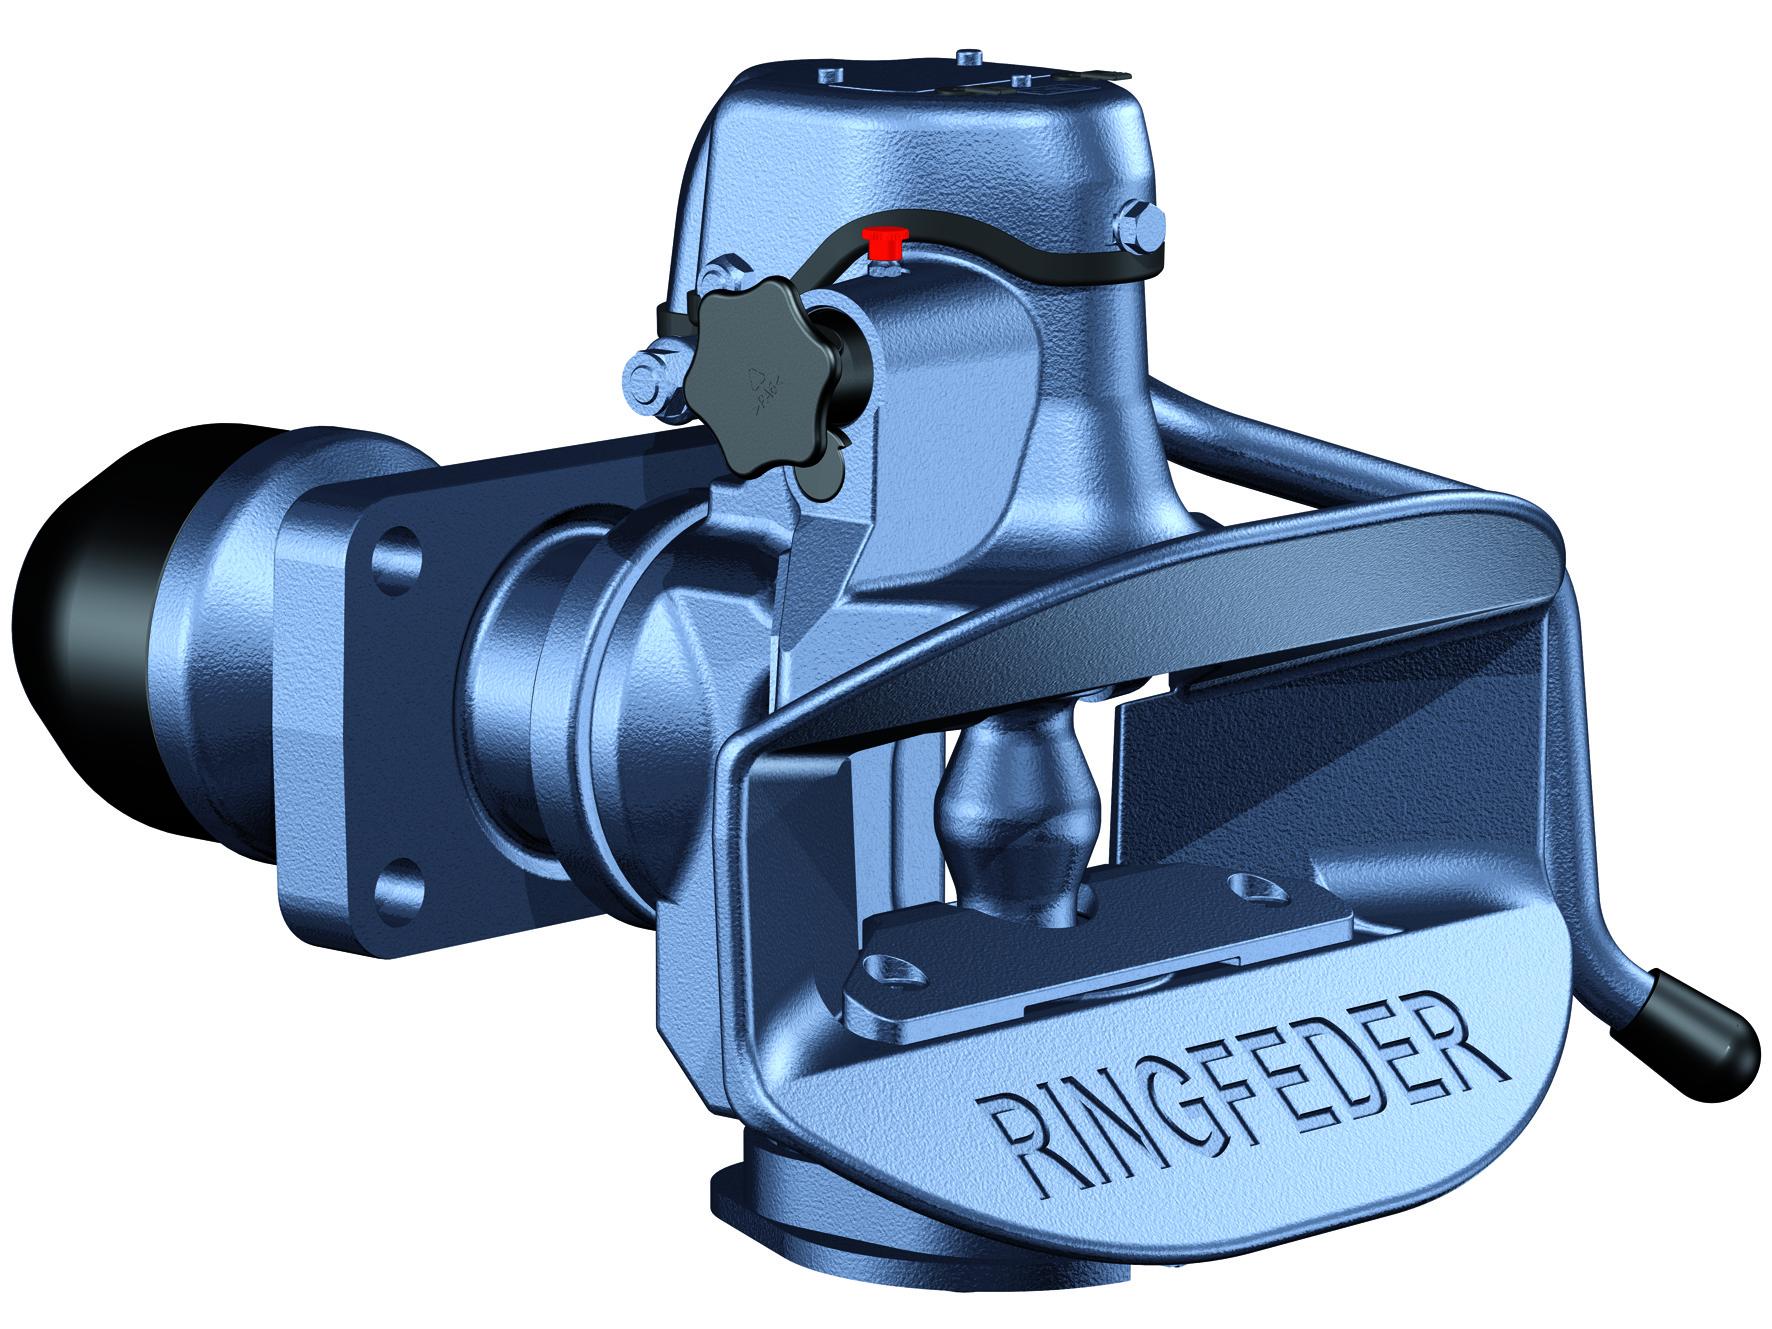 Сцепное устройство Ringfeder